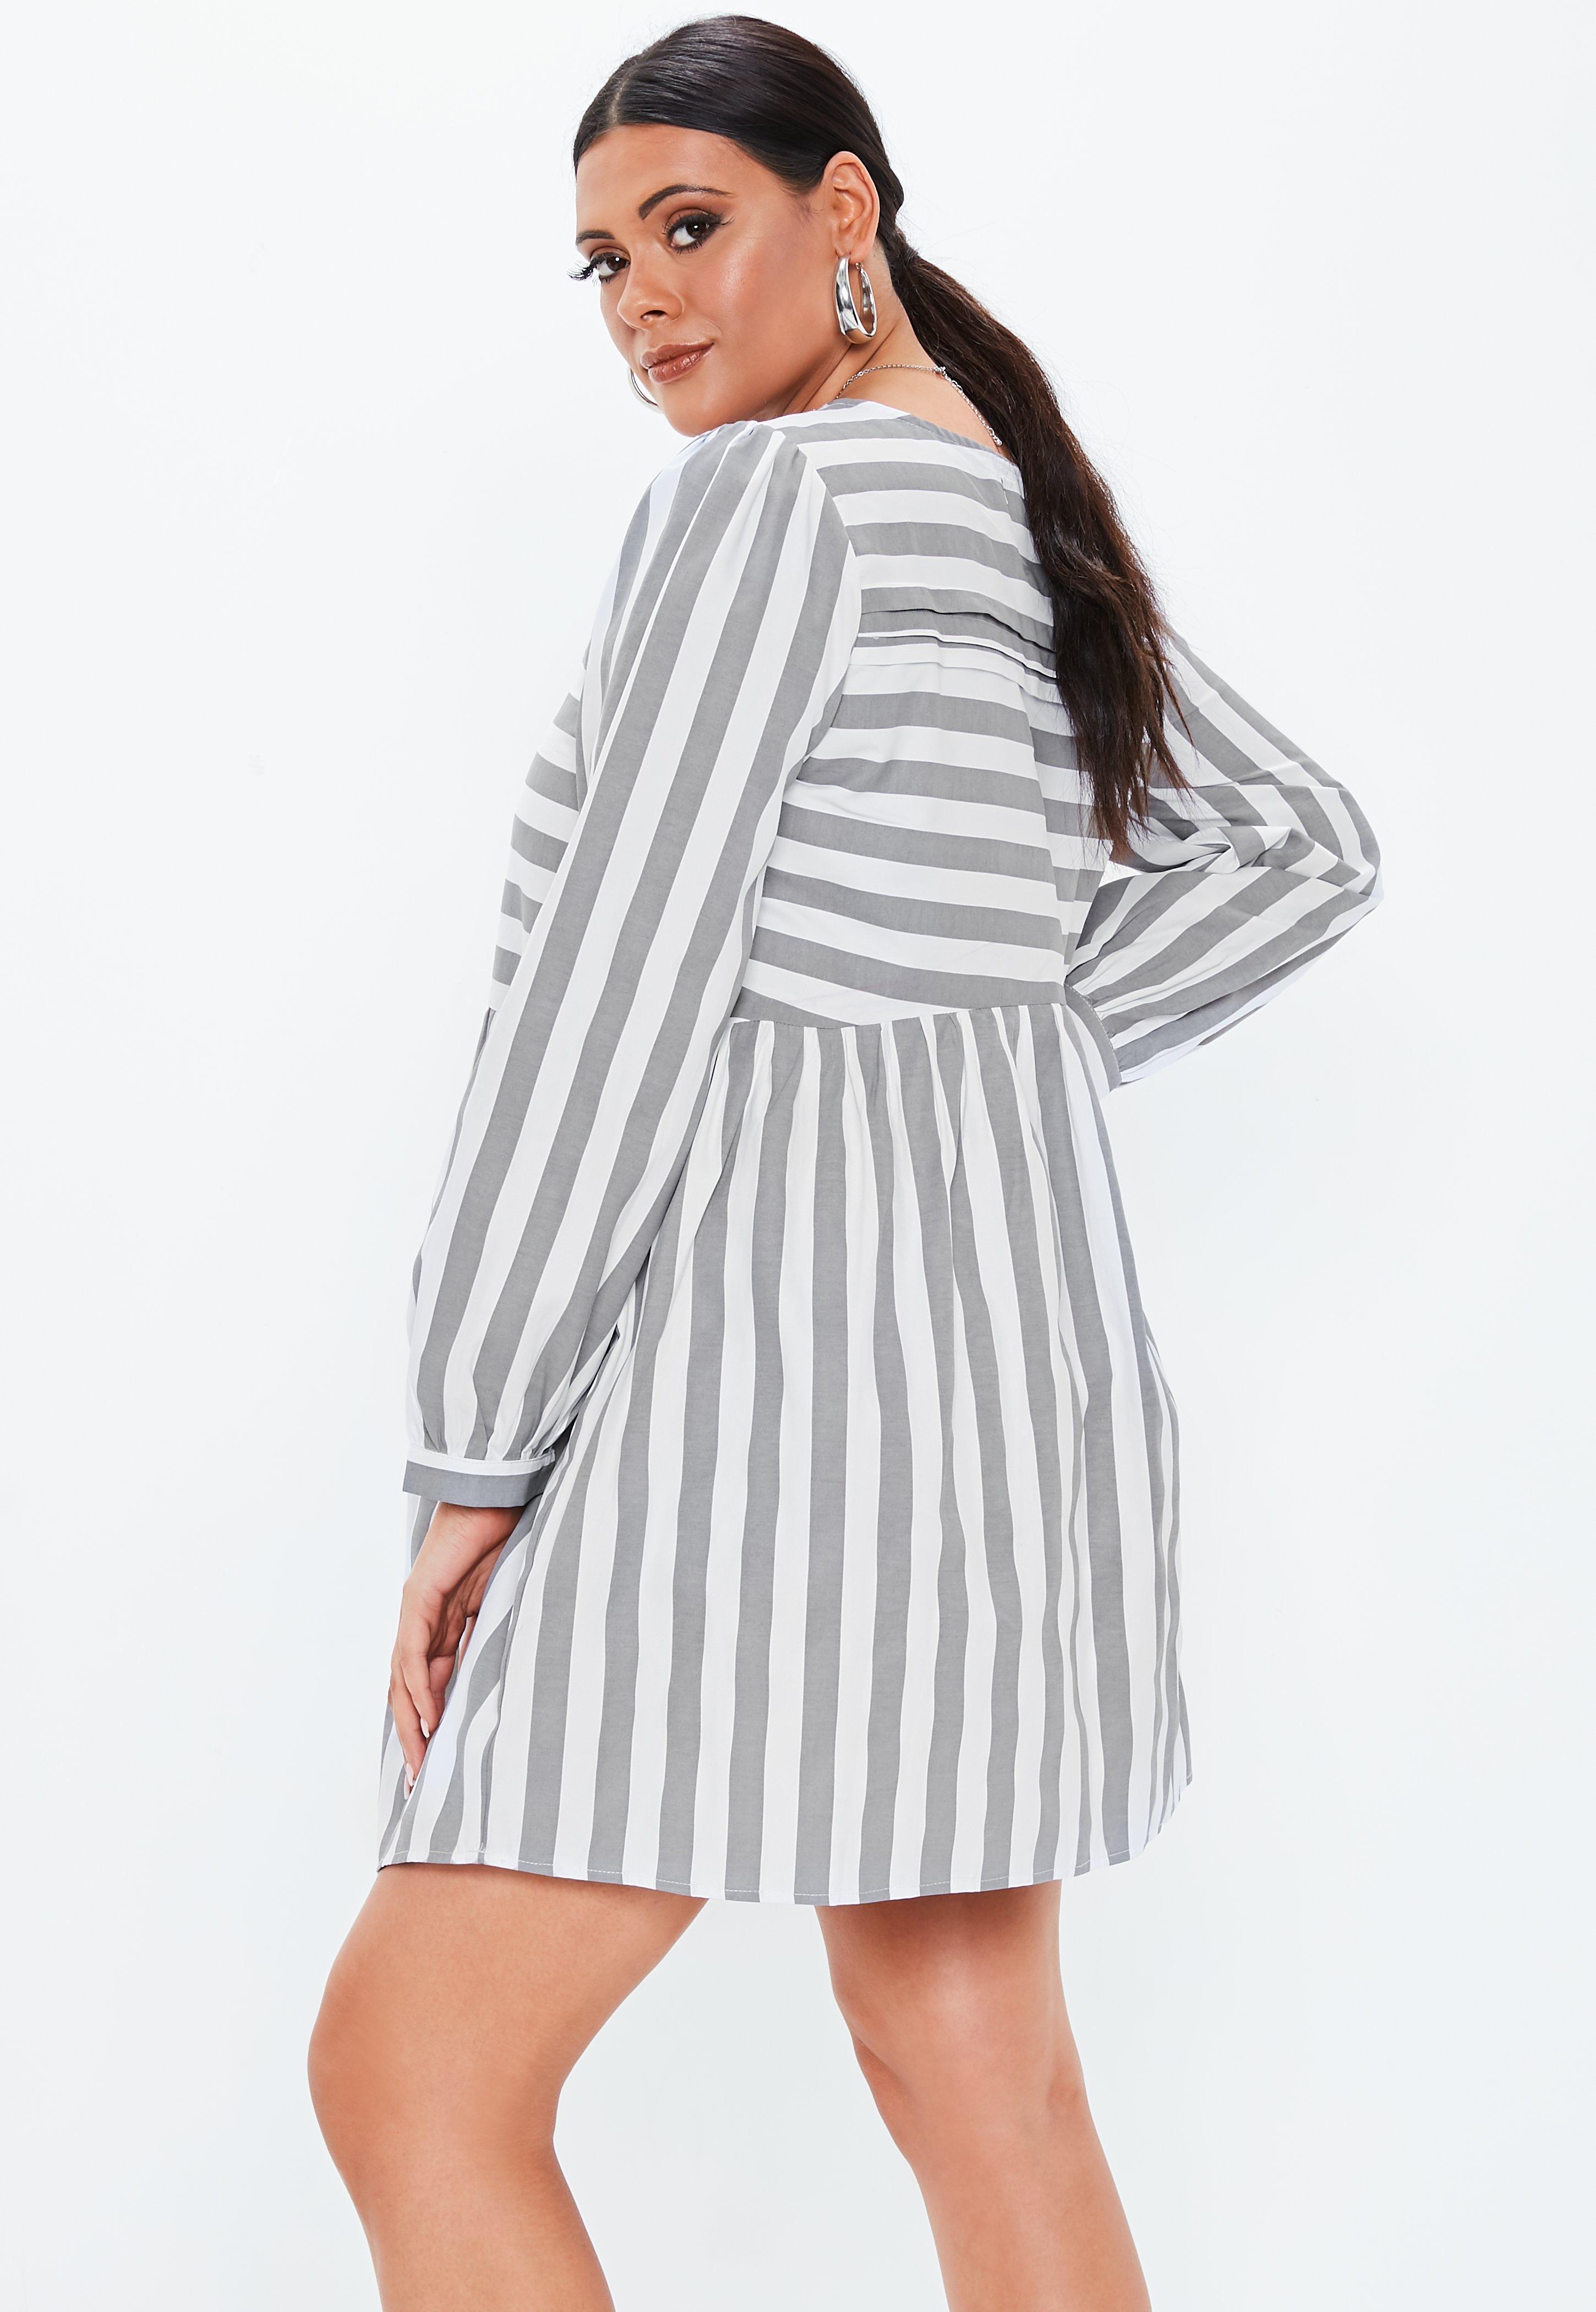 Long Sleeve Plus Size Skater Dress – DACC